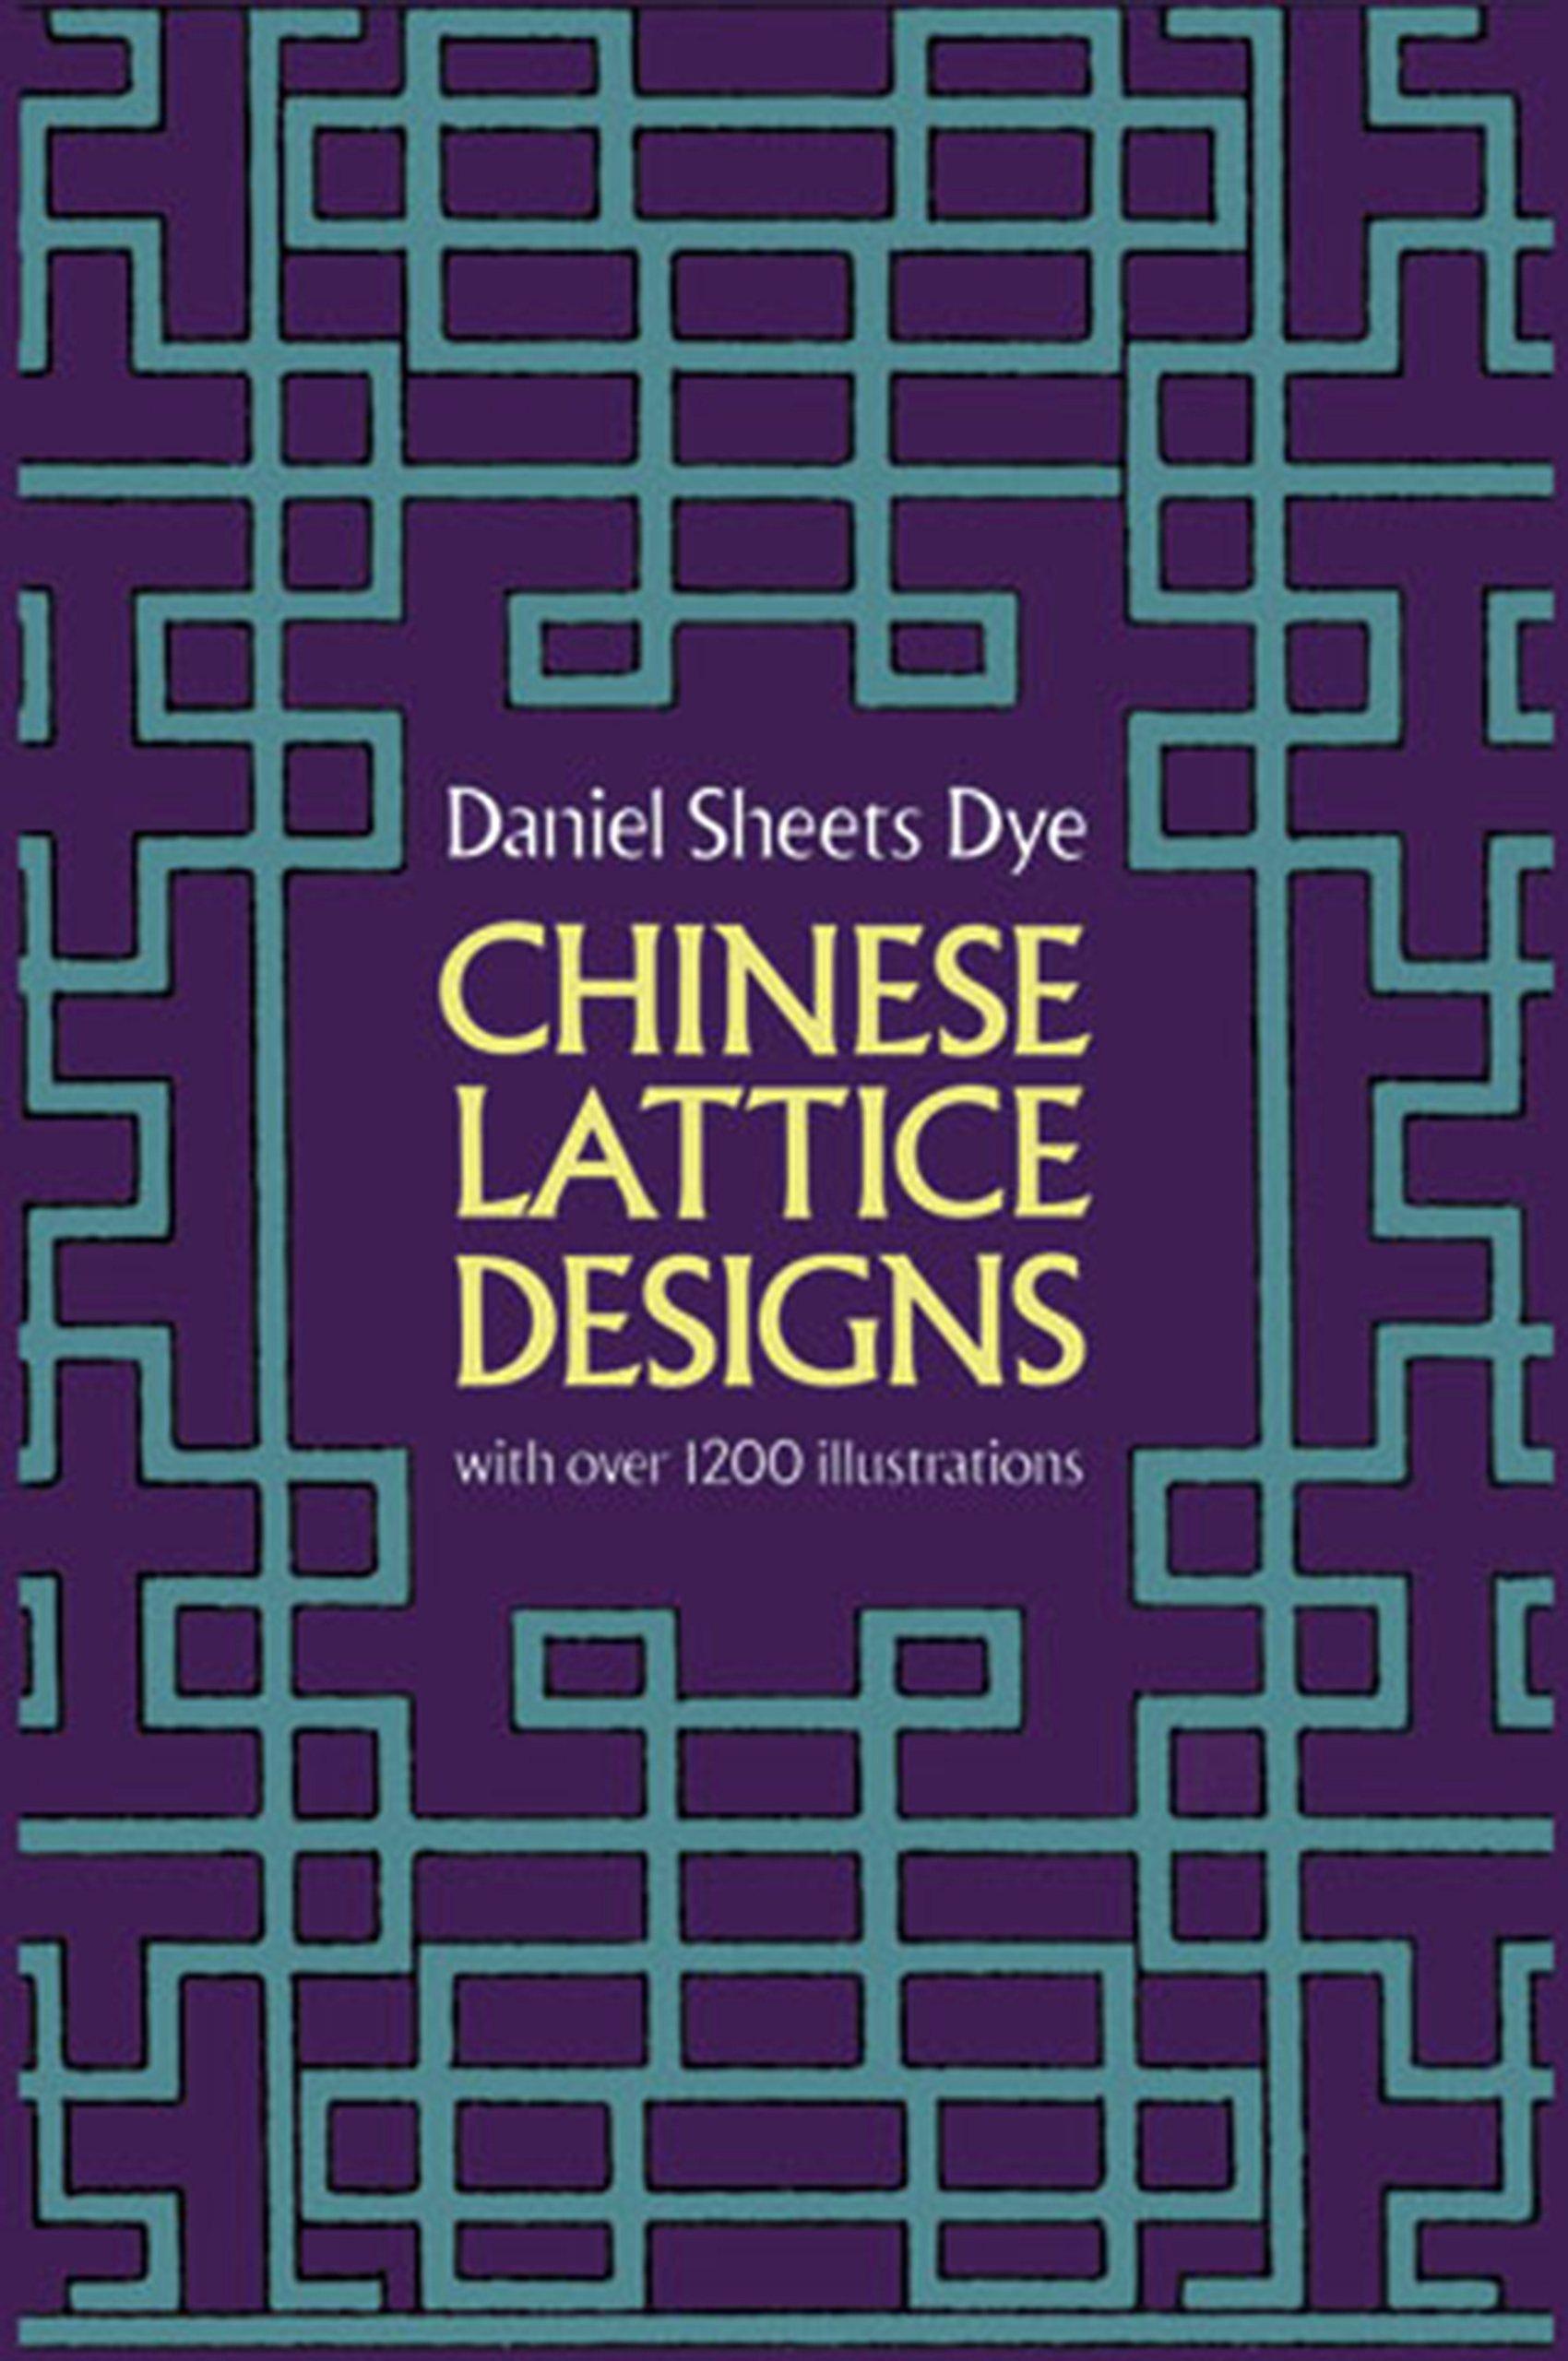 Chinese Lattice Designs (Dover Pictorial Archive) Paperback – June 1, 1974 Daniel Sheets Dye Dover Publications 0486230961 Asia